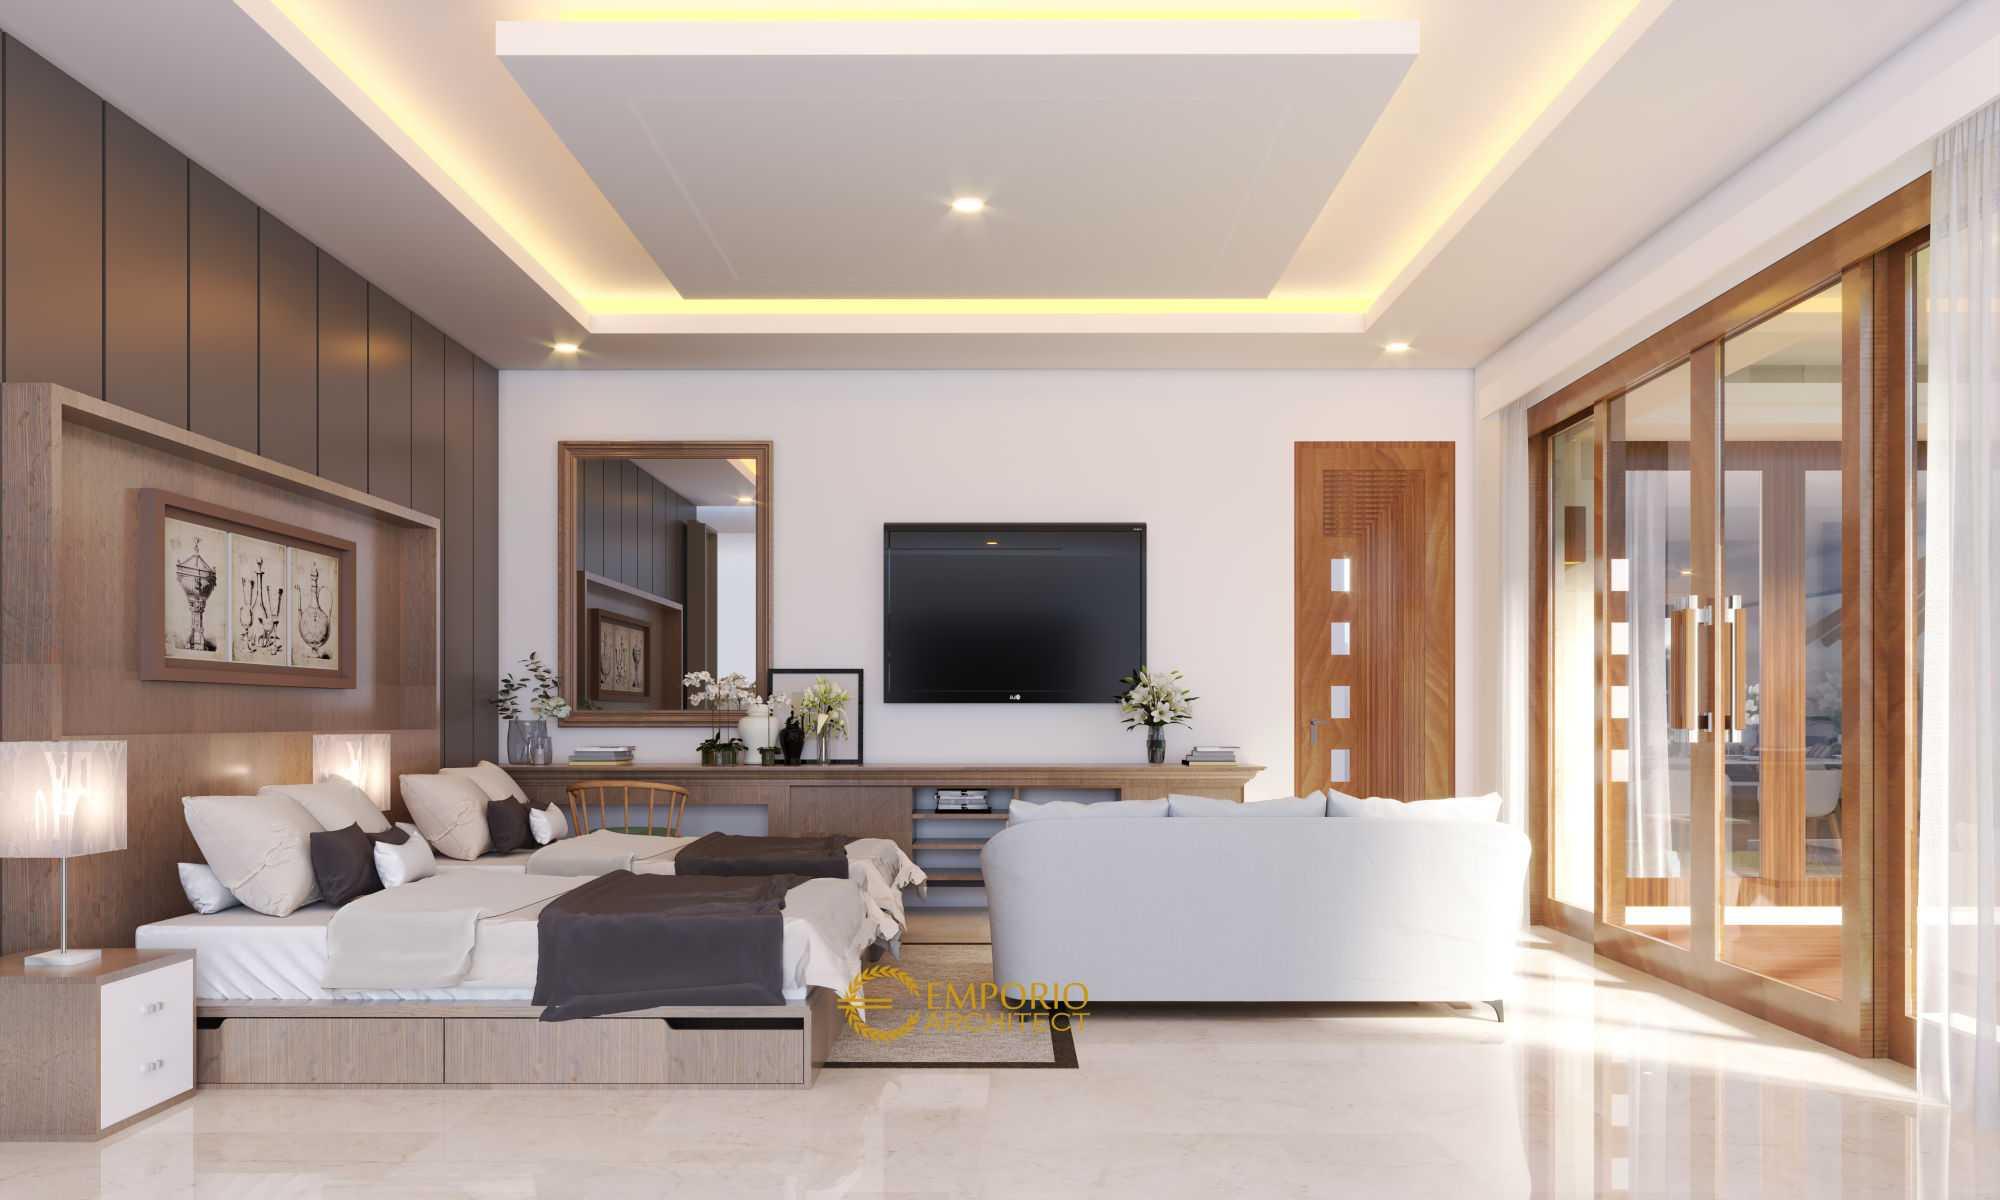 Emporio Architect Jasa Arsitek Makassar Desain Rumah Villa Bali Tropis 683 @ Makassar Makassar, Kota Makassar, Sulawesi Selatan, Indonesia Makassar, Kota Makassar, Sulawesi Selatan, Indonesia Emporio-Architect-Jasa-Arsitek-Makassar-Desain-Rumah-Villa-Bali-Tropis-683-Makassar  81779